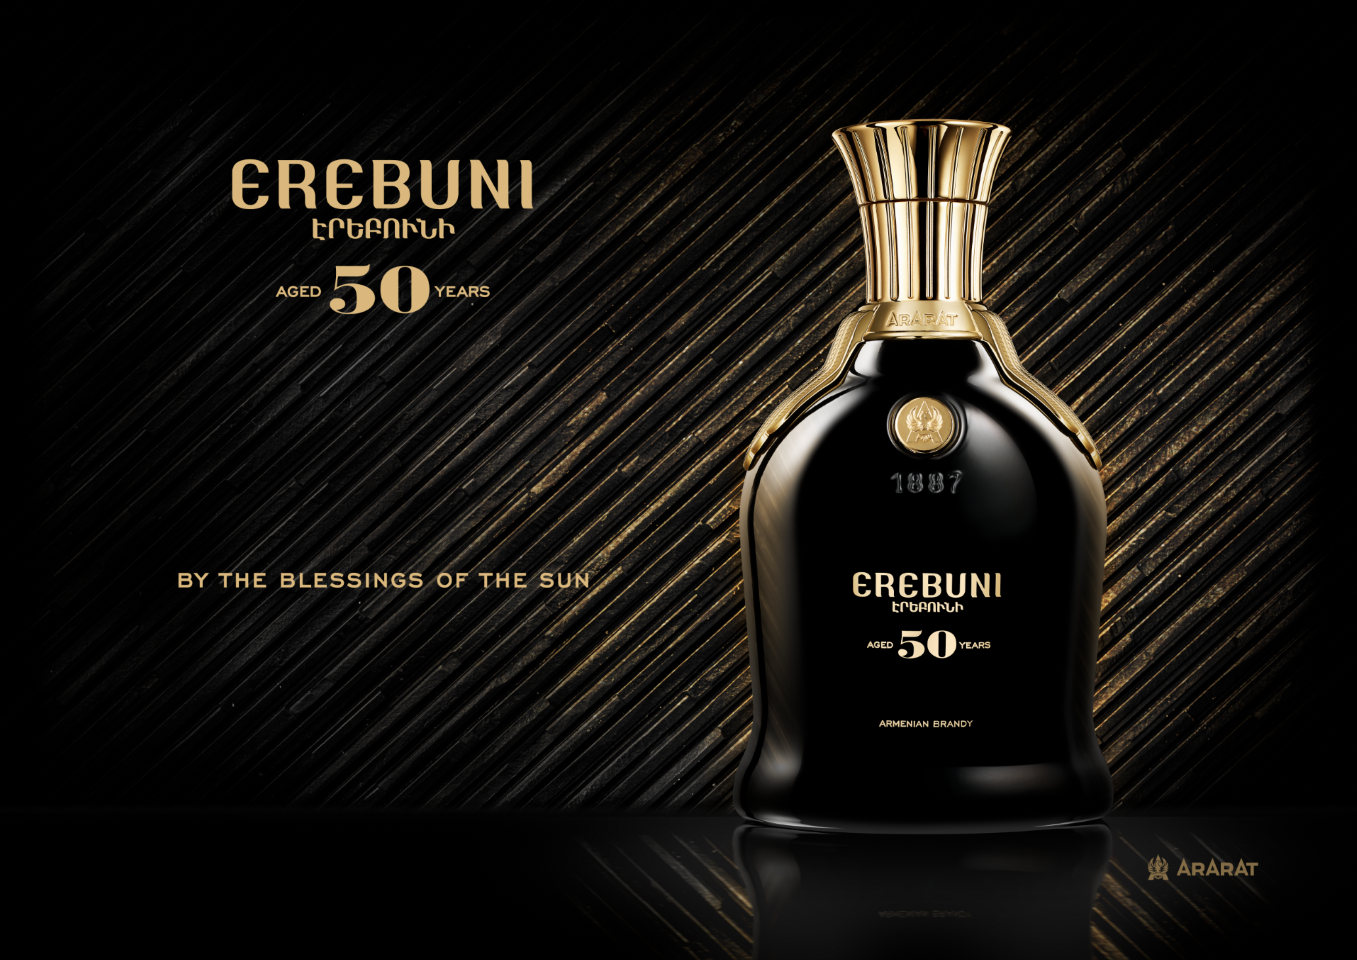 Erebuni 50 - new ultra-premium brandy of ARARAT range